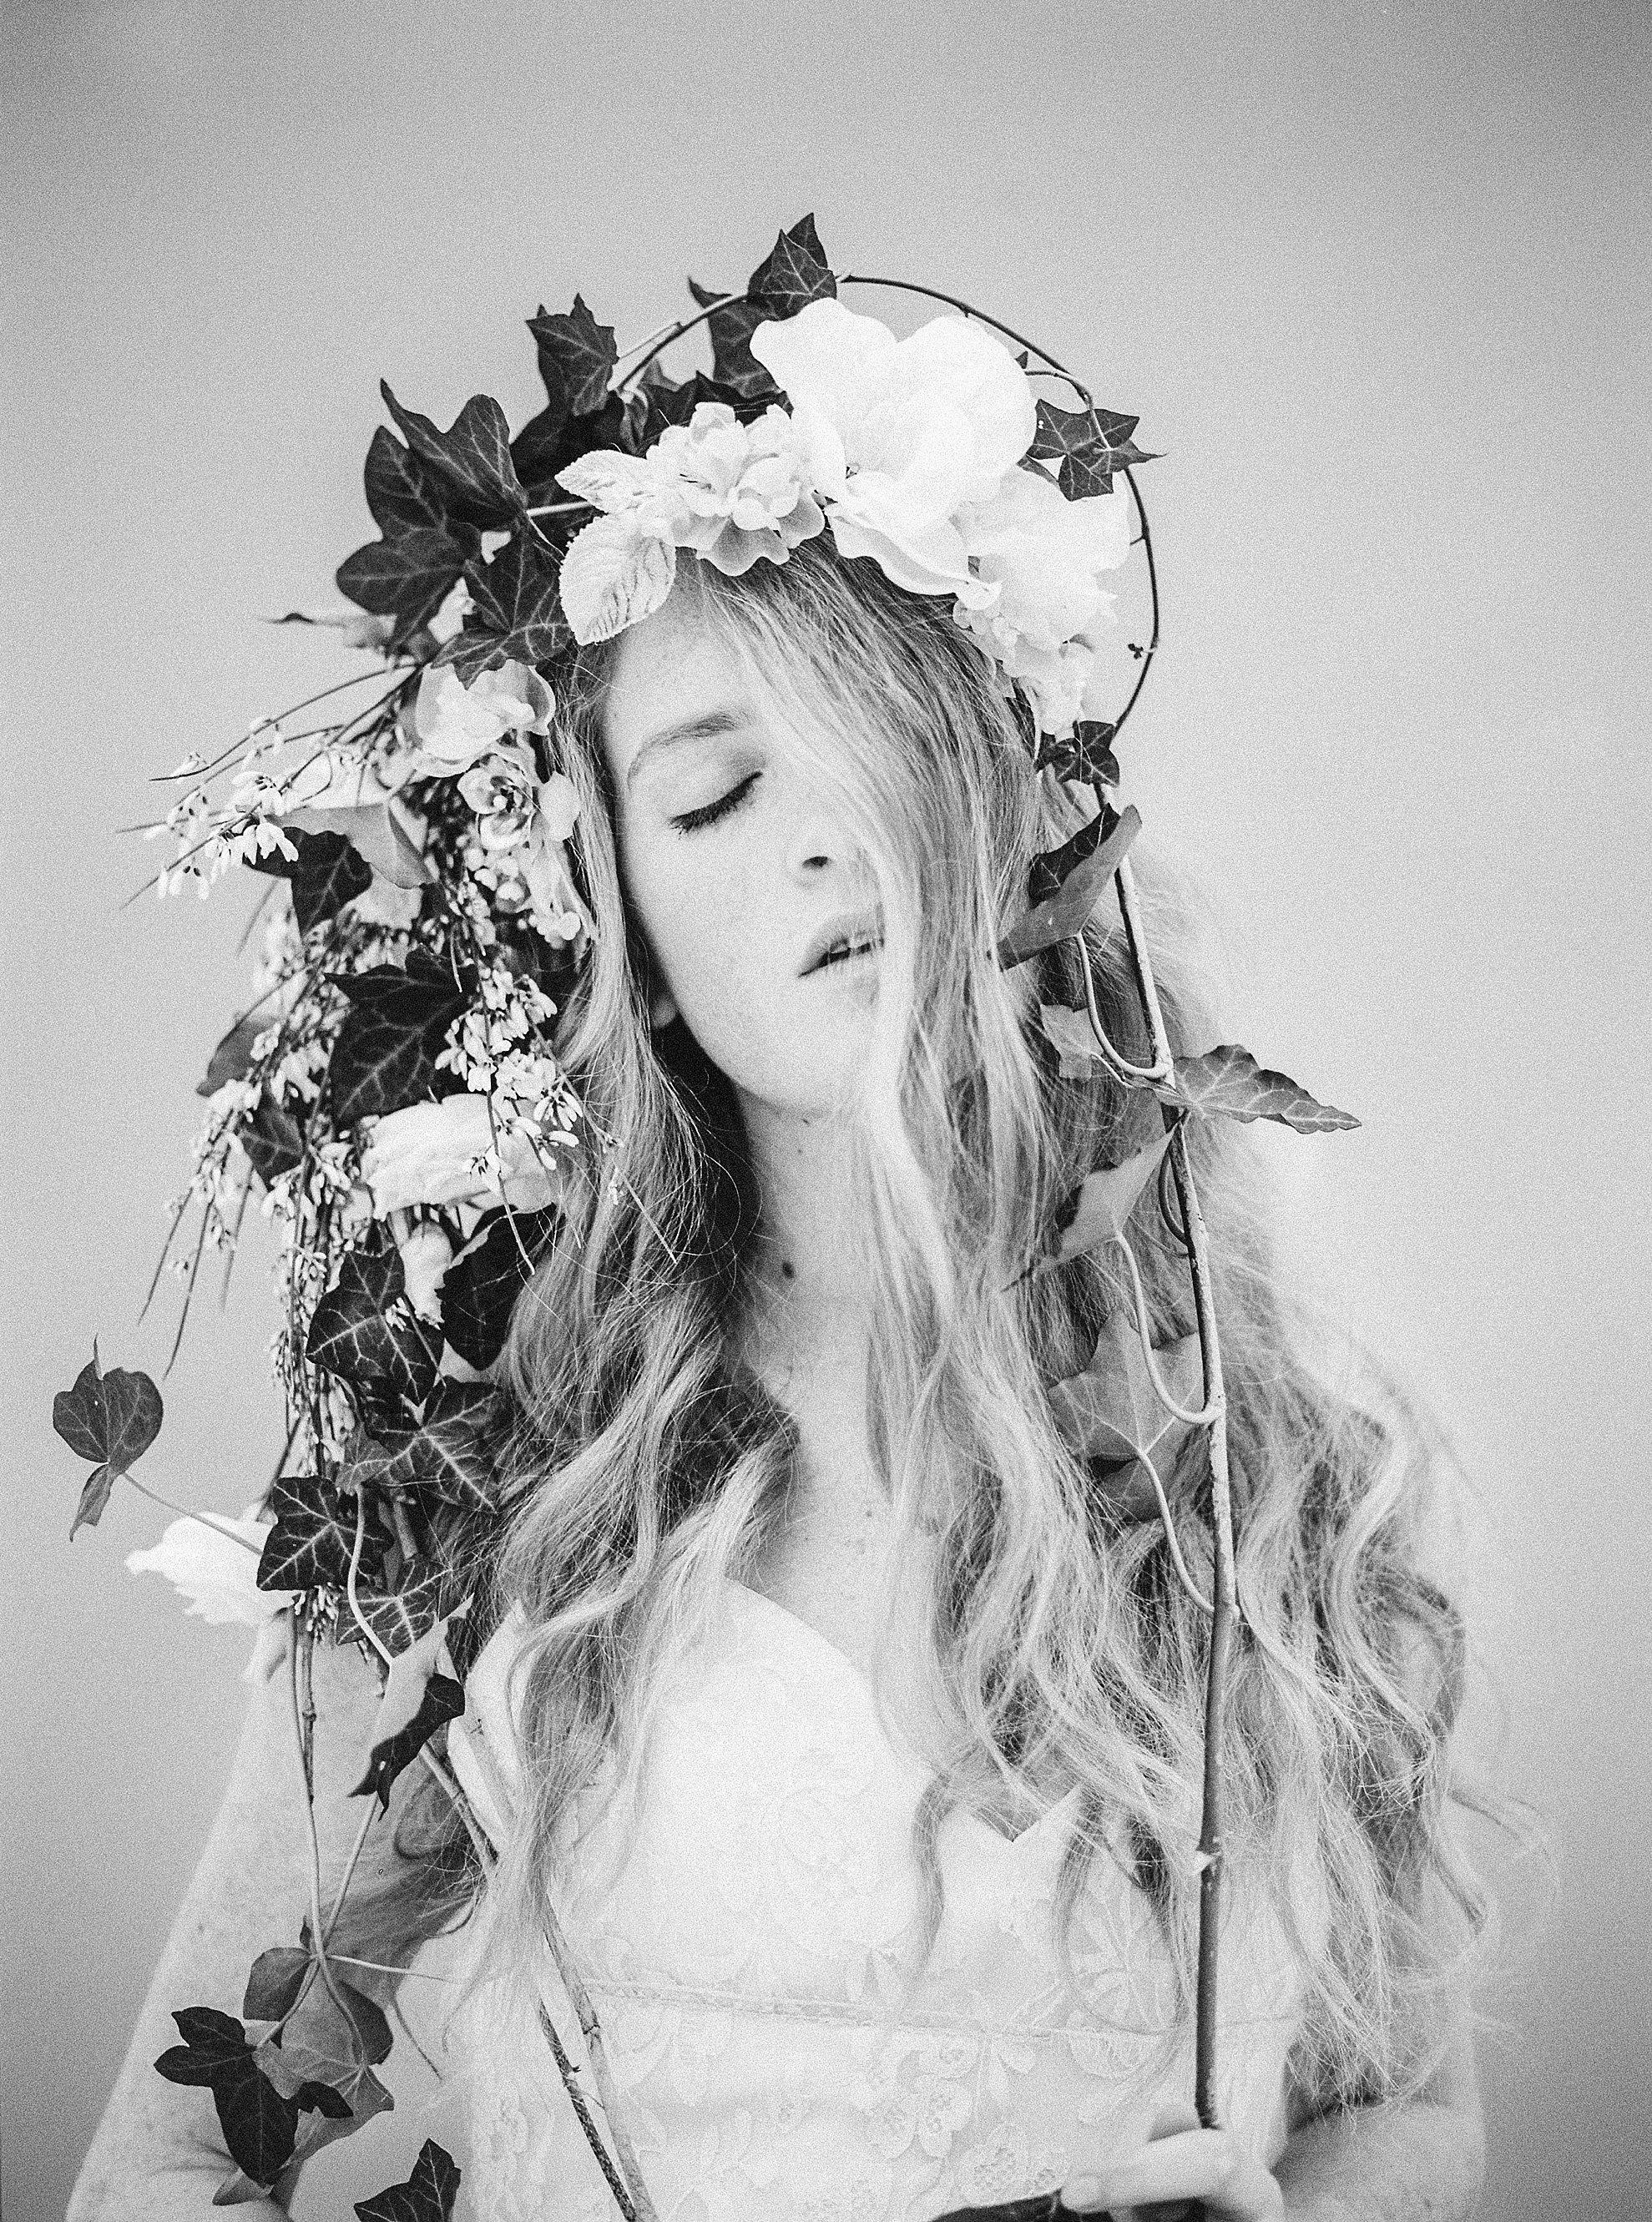 Amanda-Drost-Fotografie-mode-fashion-editorial-bridal_0008.jpg